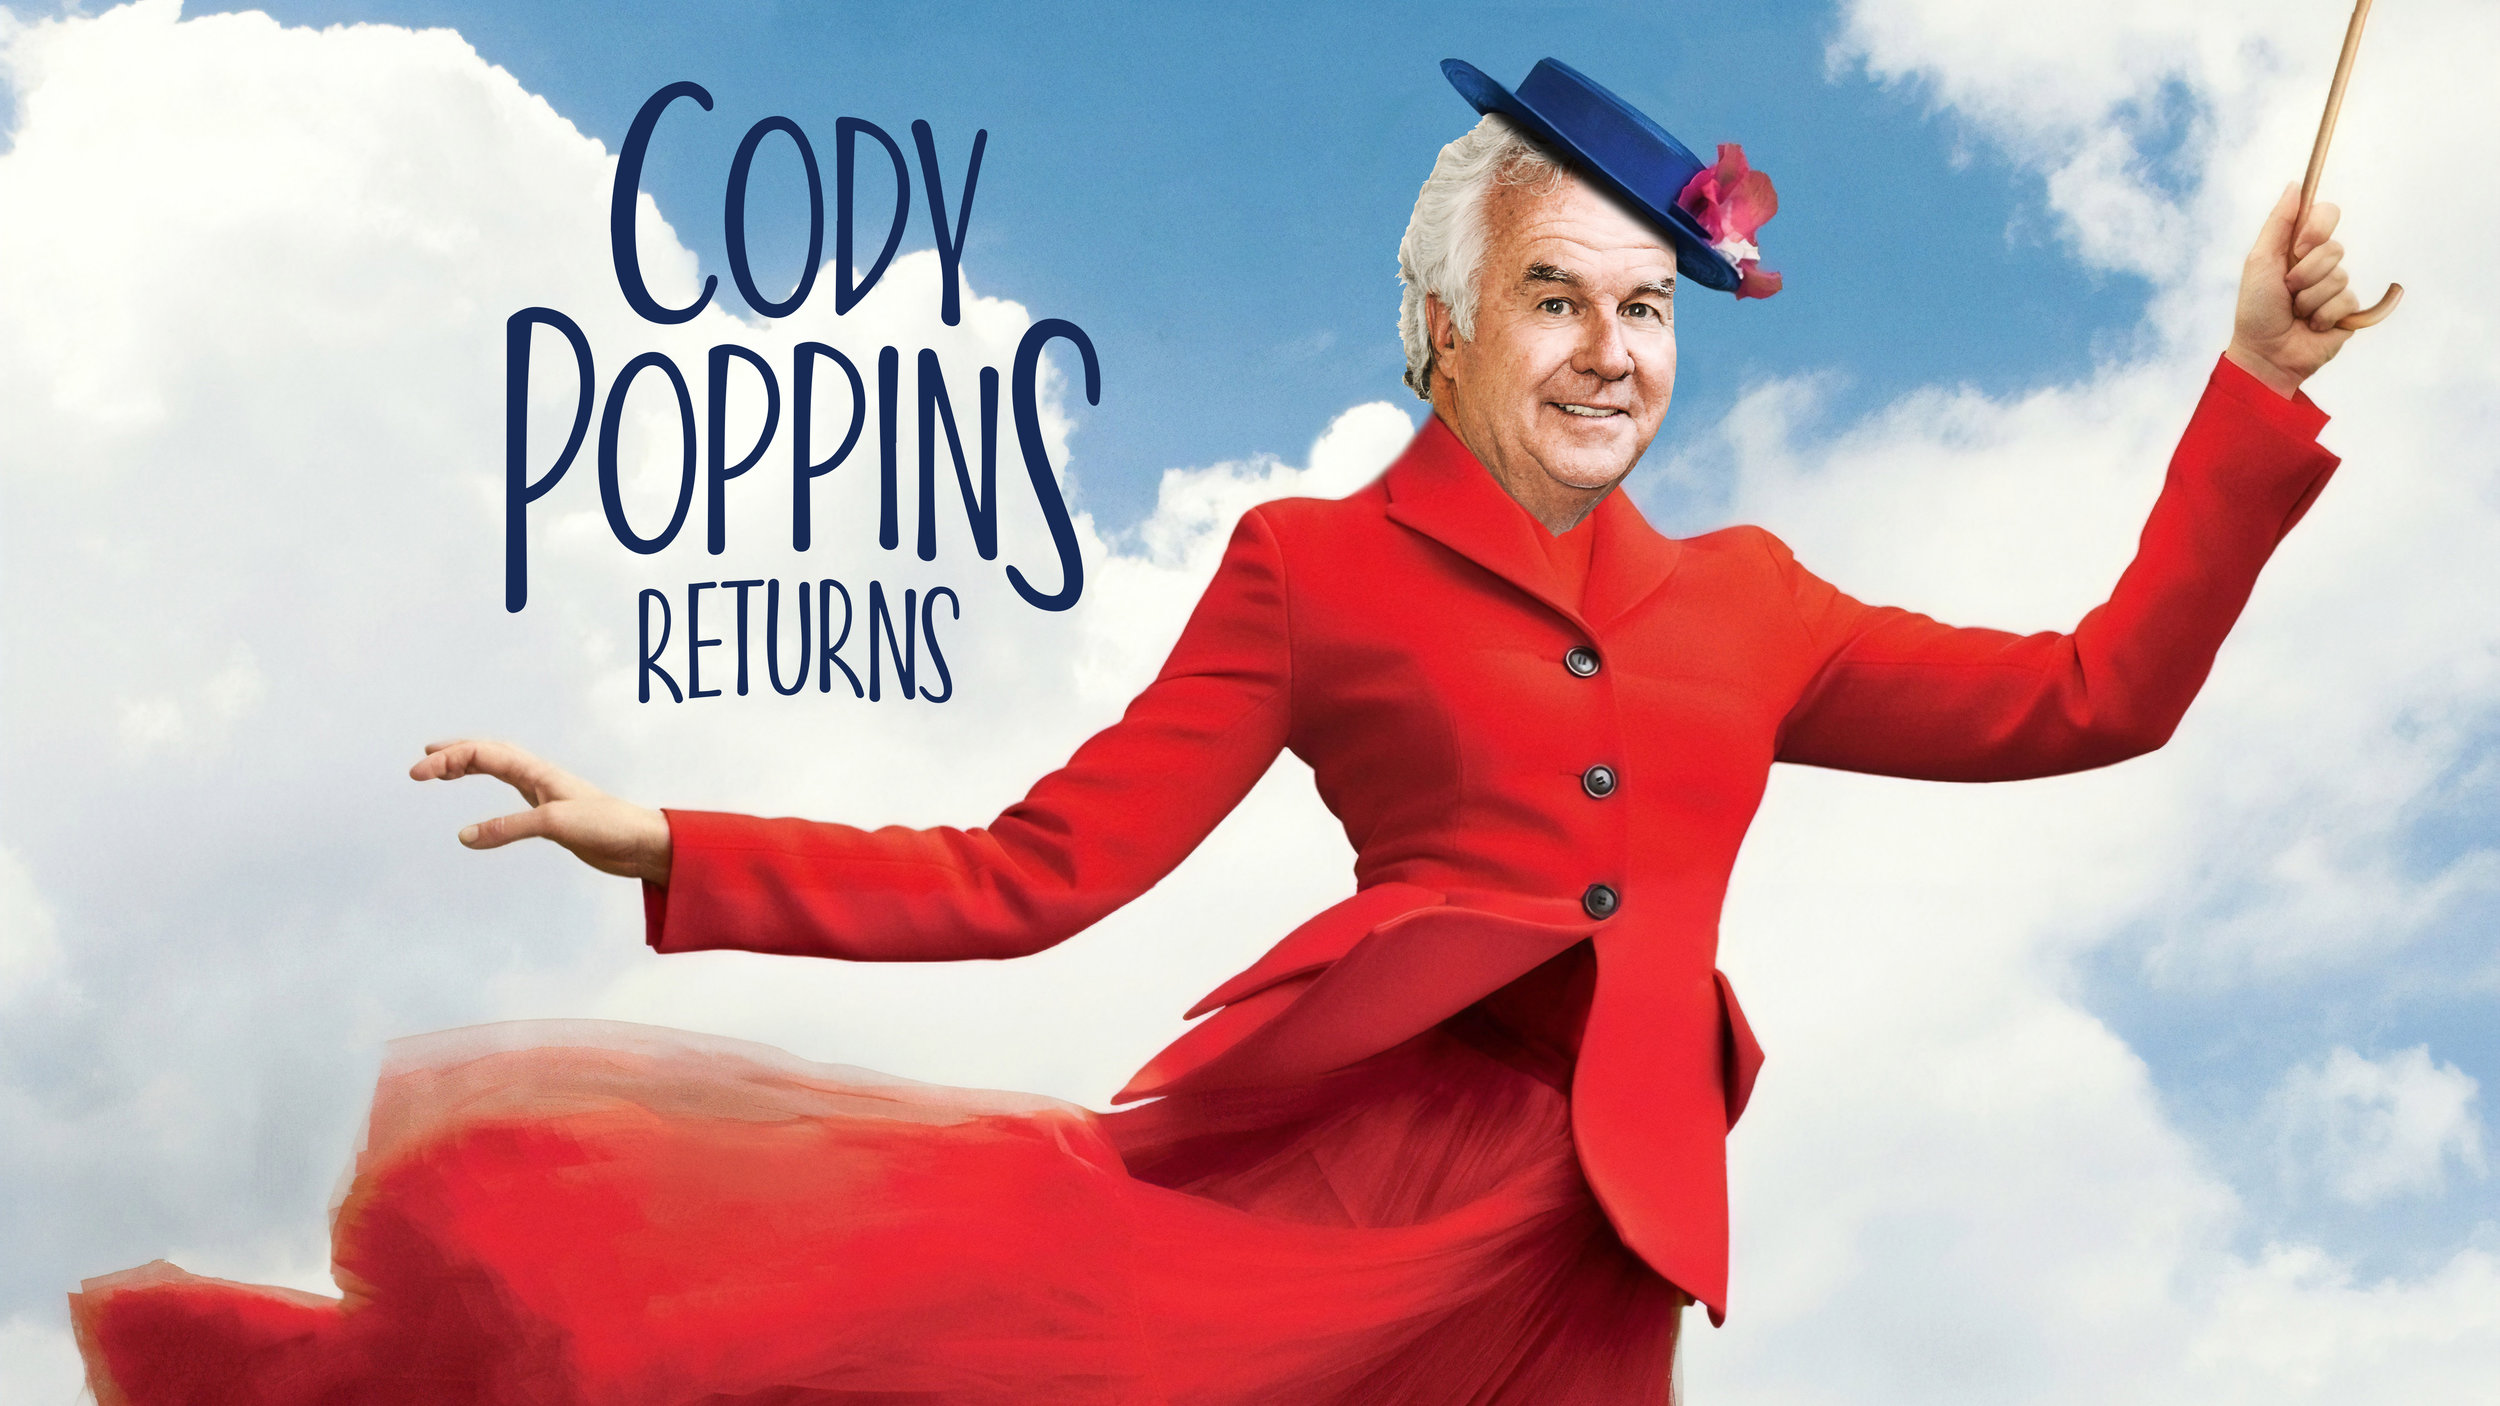 Cody-Poppins-Returns.jpg